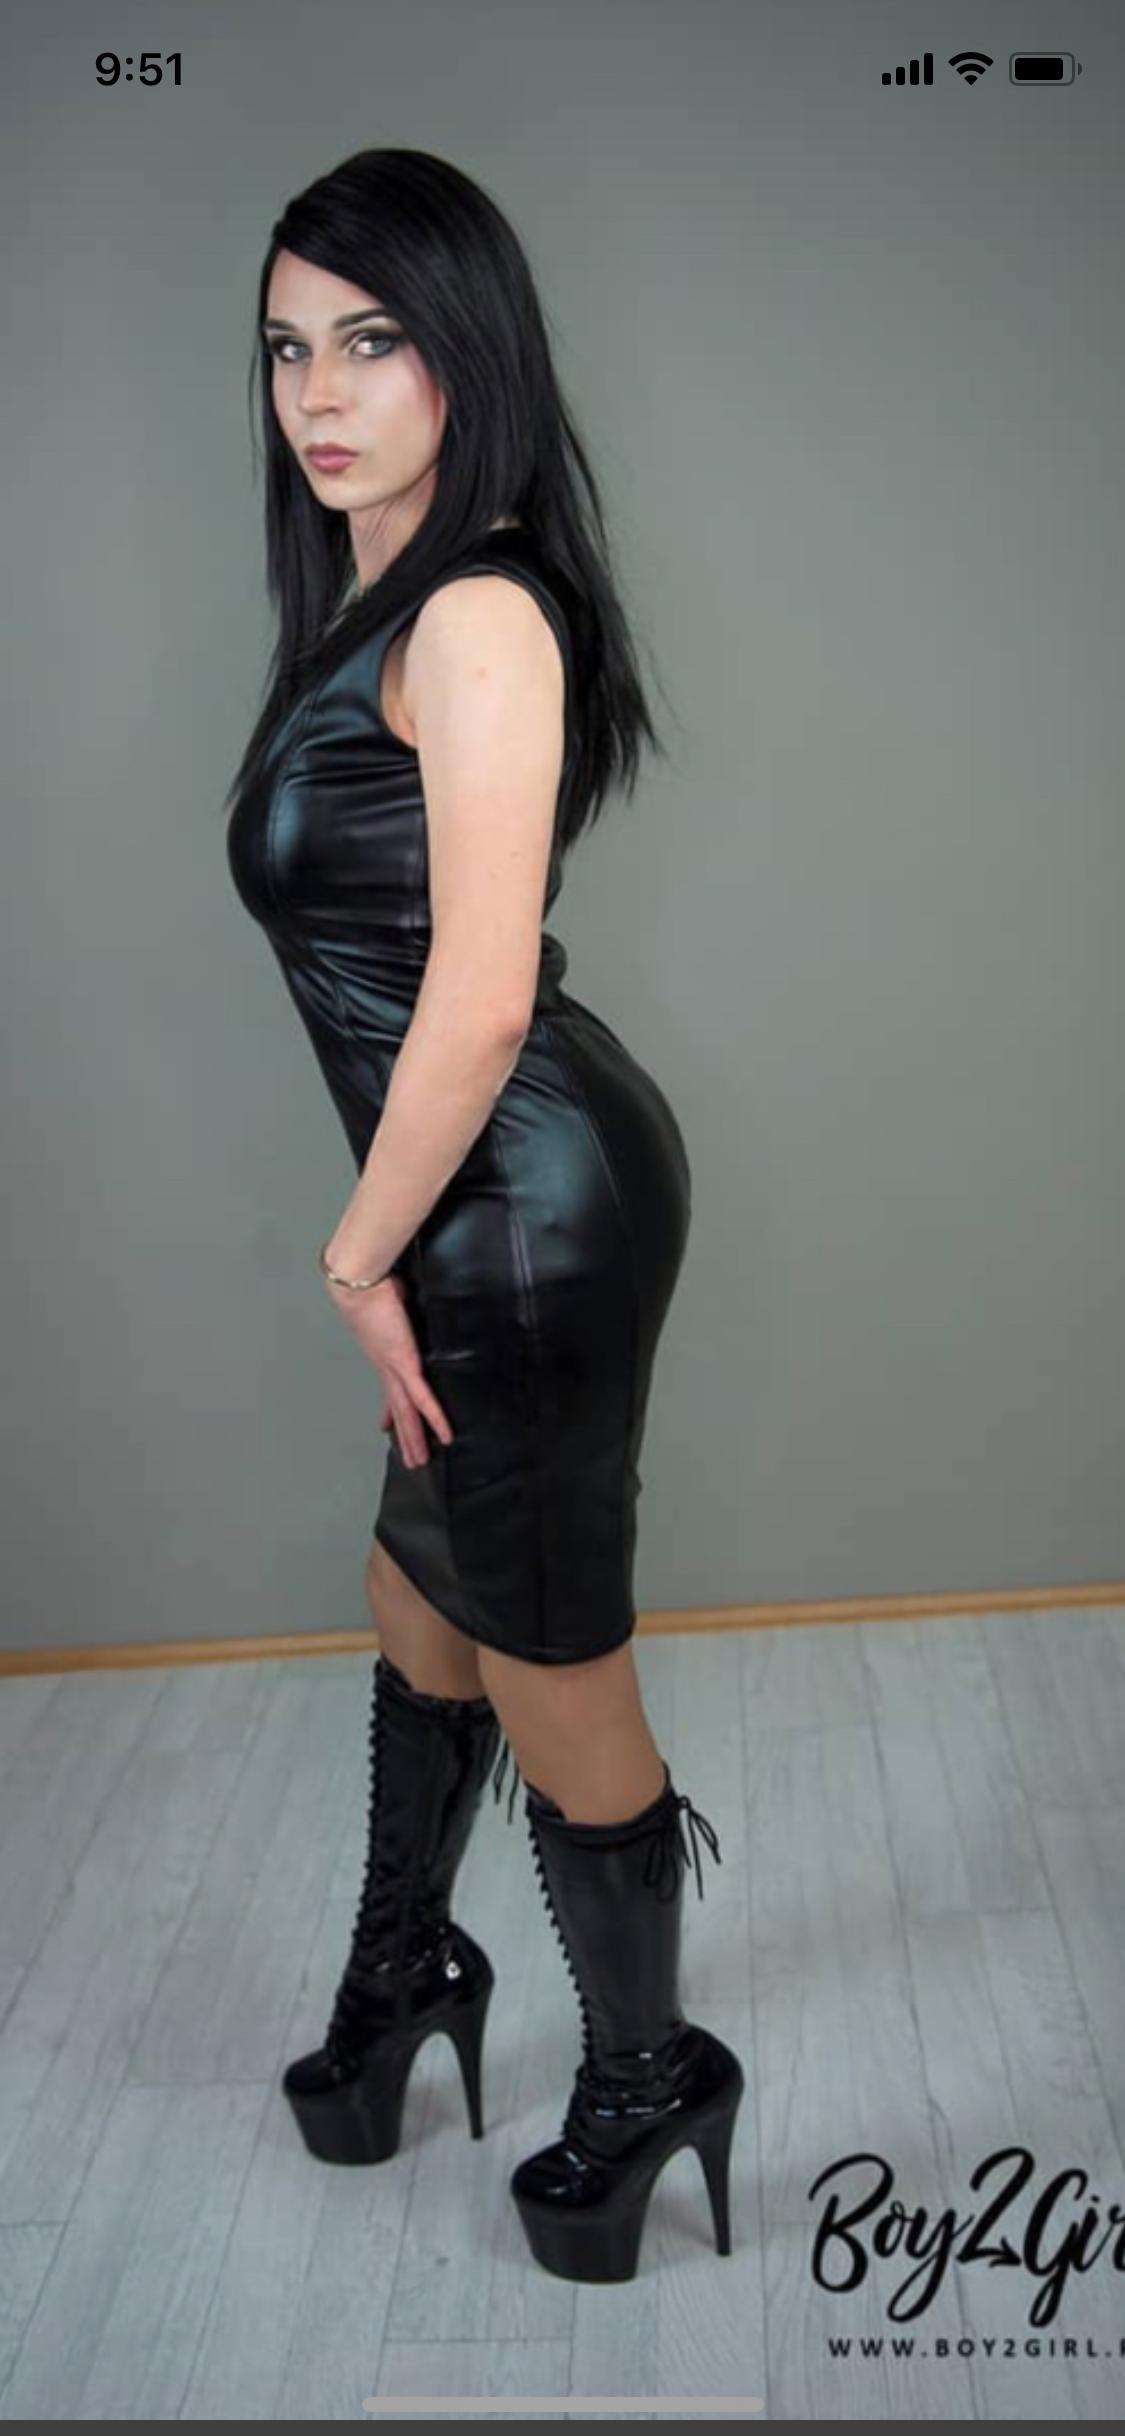 Pin on Leather Skirt Hotties